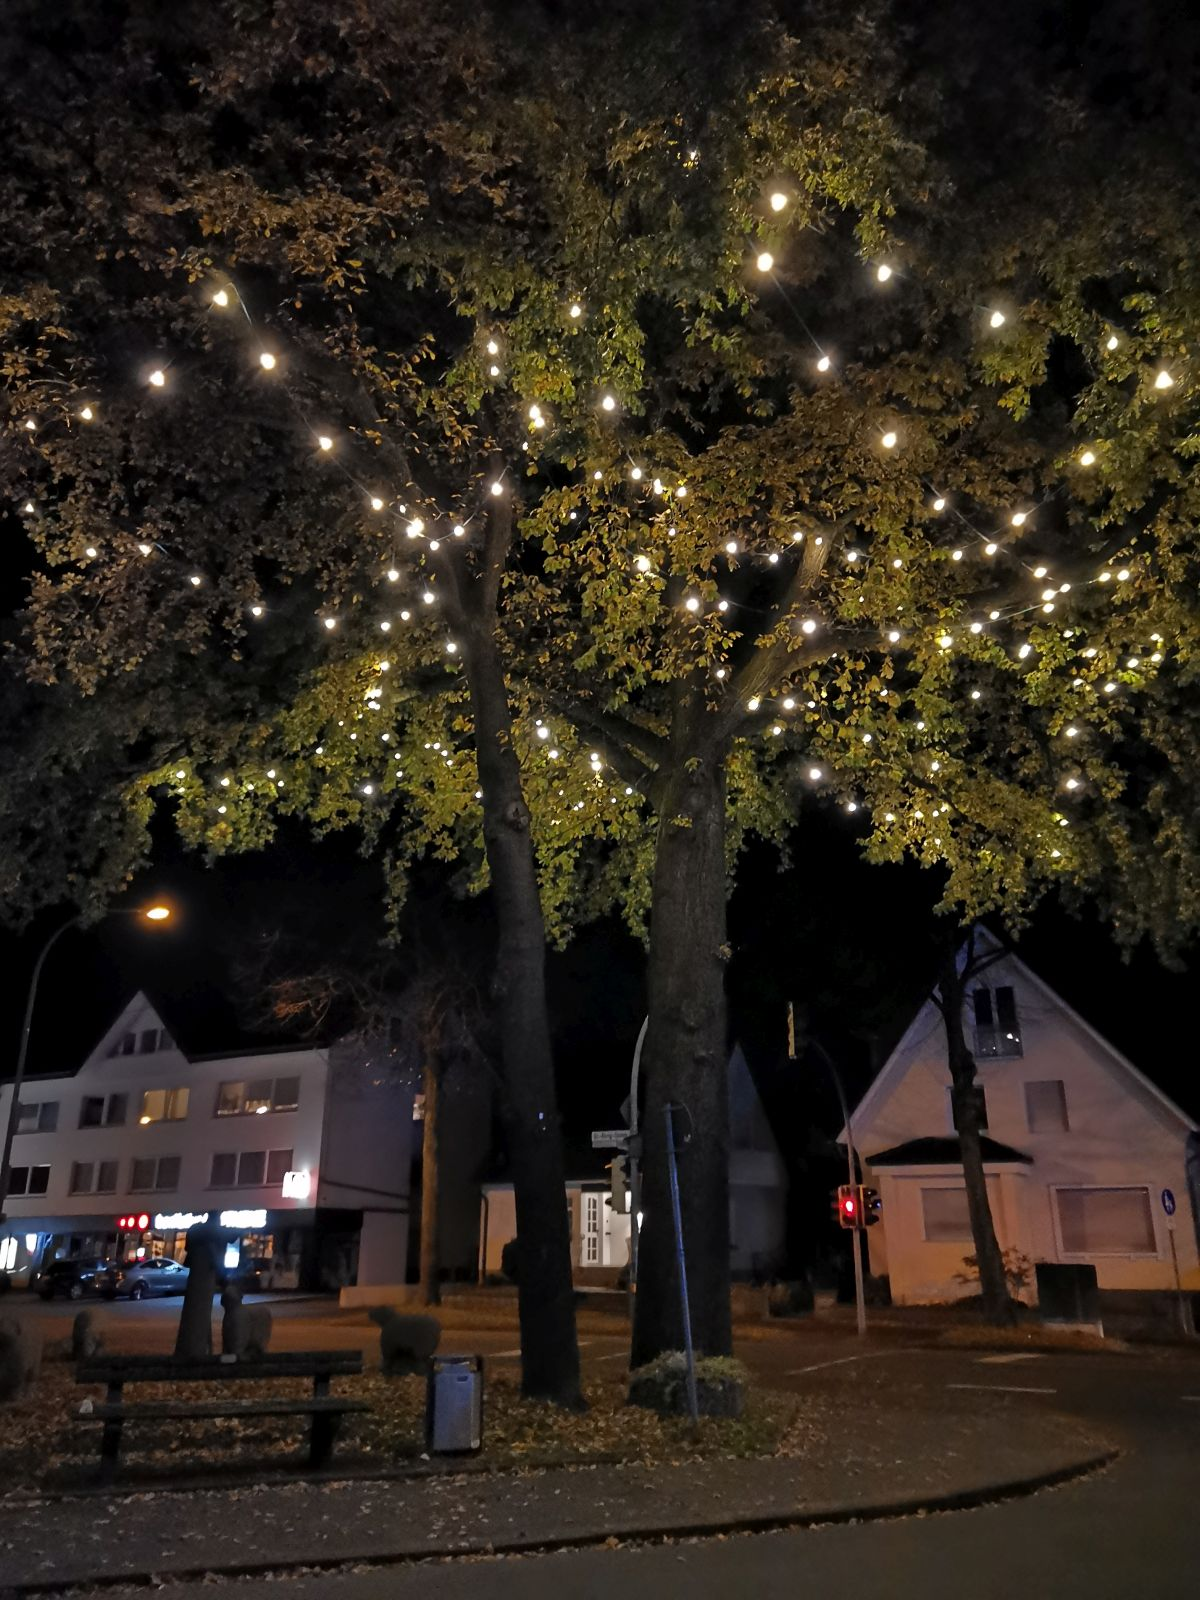 LED-Beleutung - Das Ergebnis